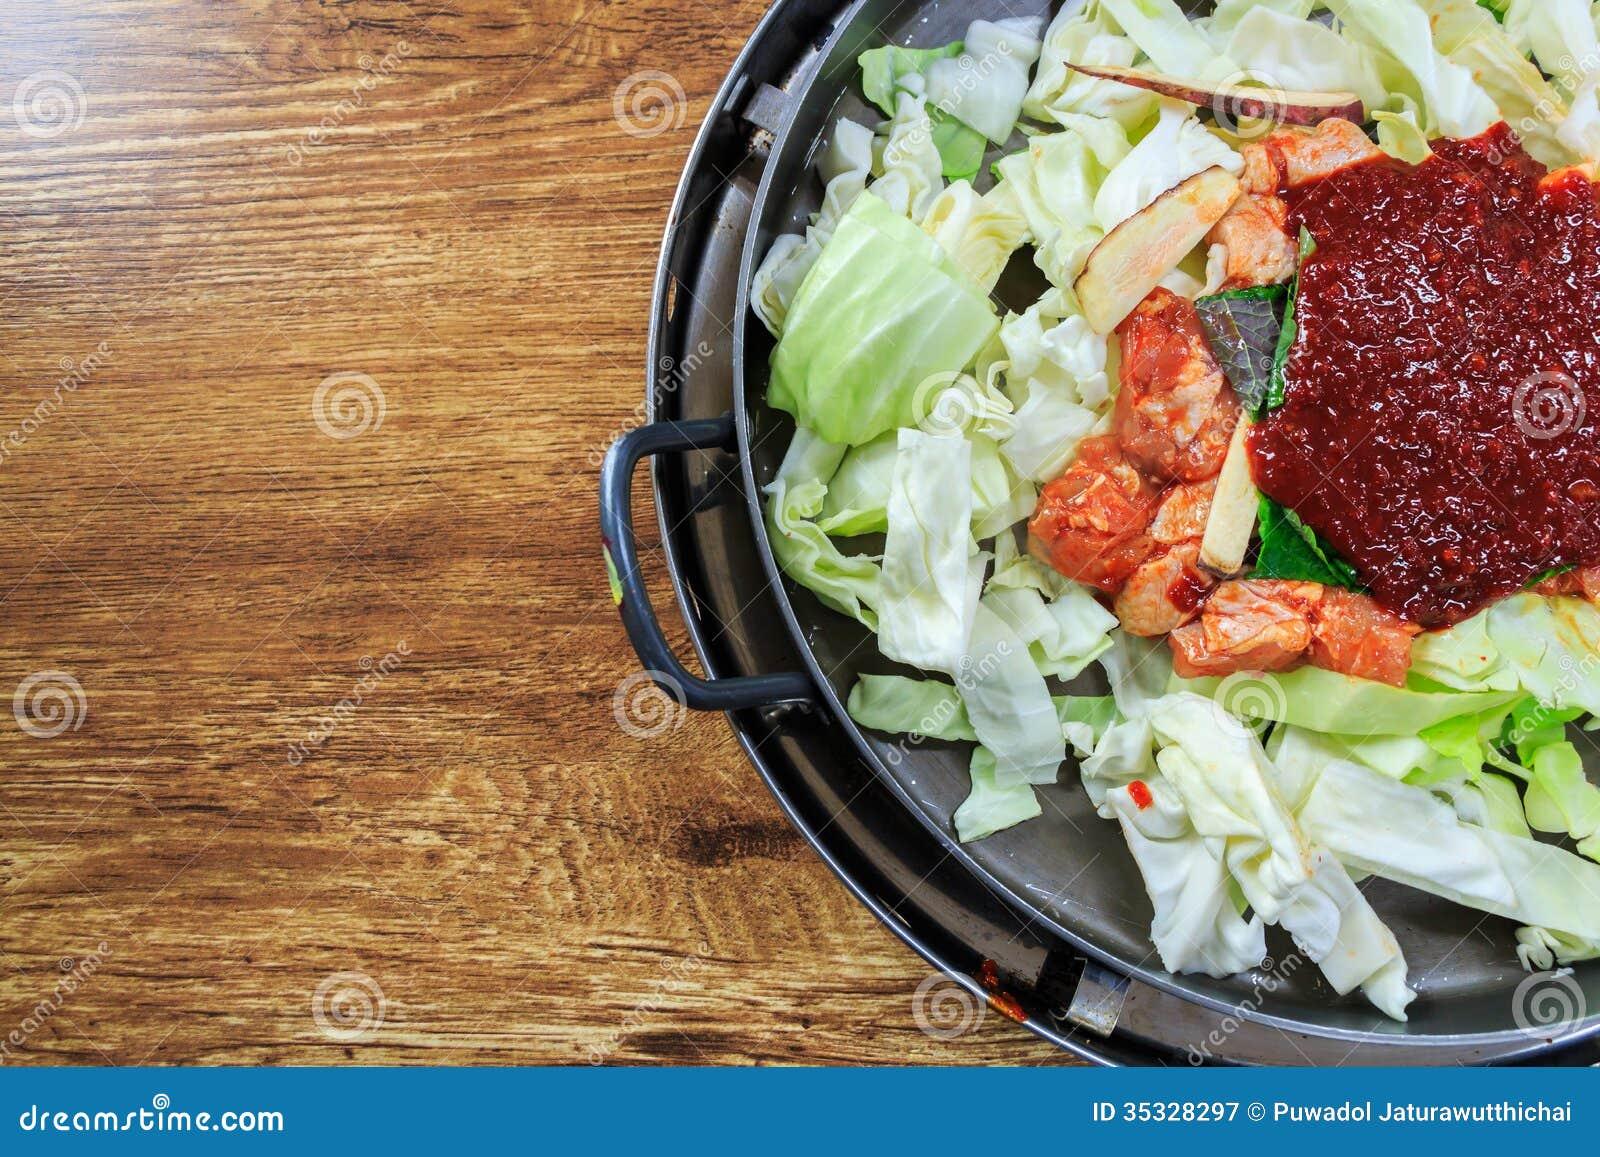 Seasoning Of Korean Food Stock Image Image Of Cook